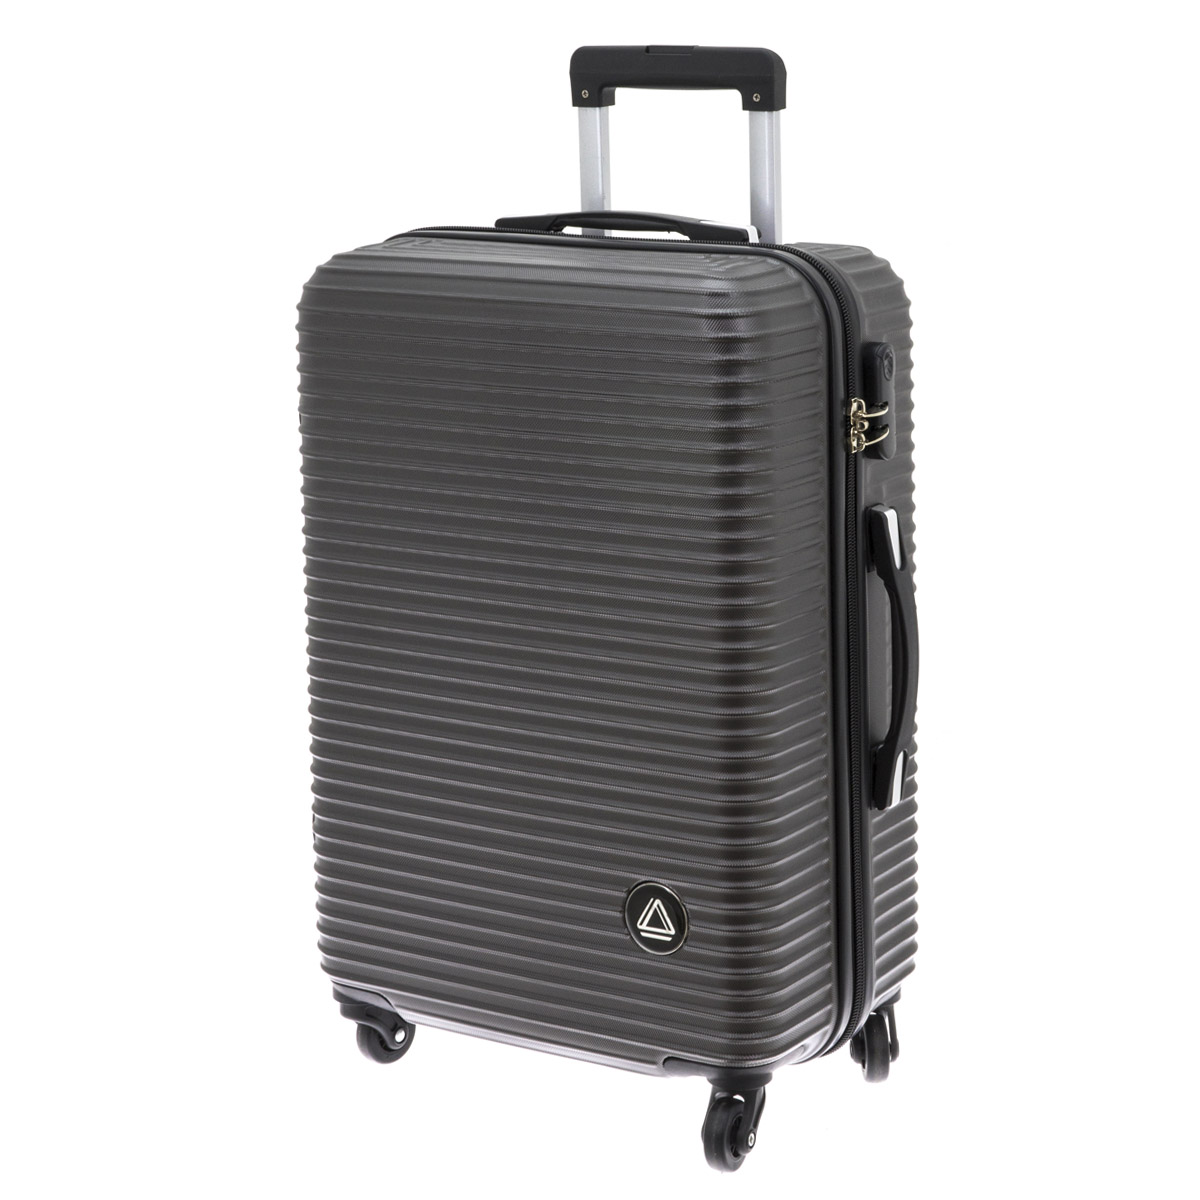 Valise trolley coque ABS \'Davidt\'s\' gris anthracite - 65x44x26 cm - [Q9938]